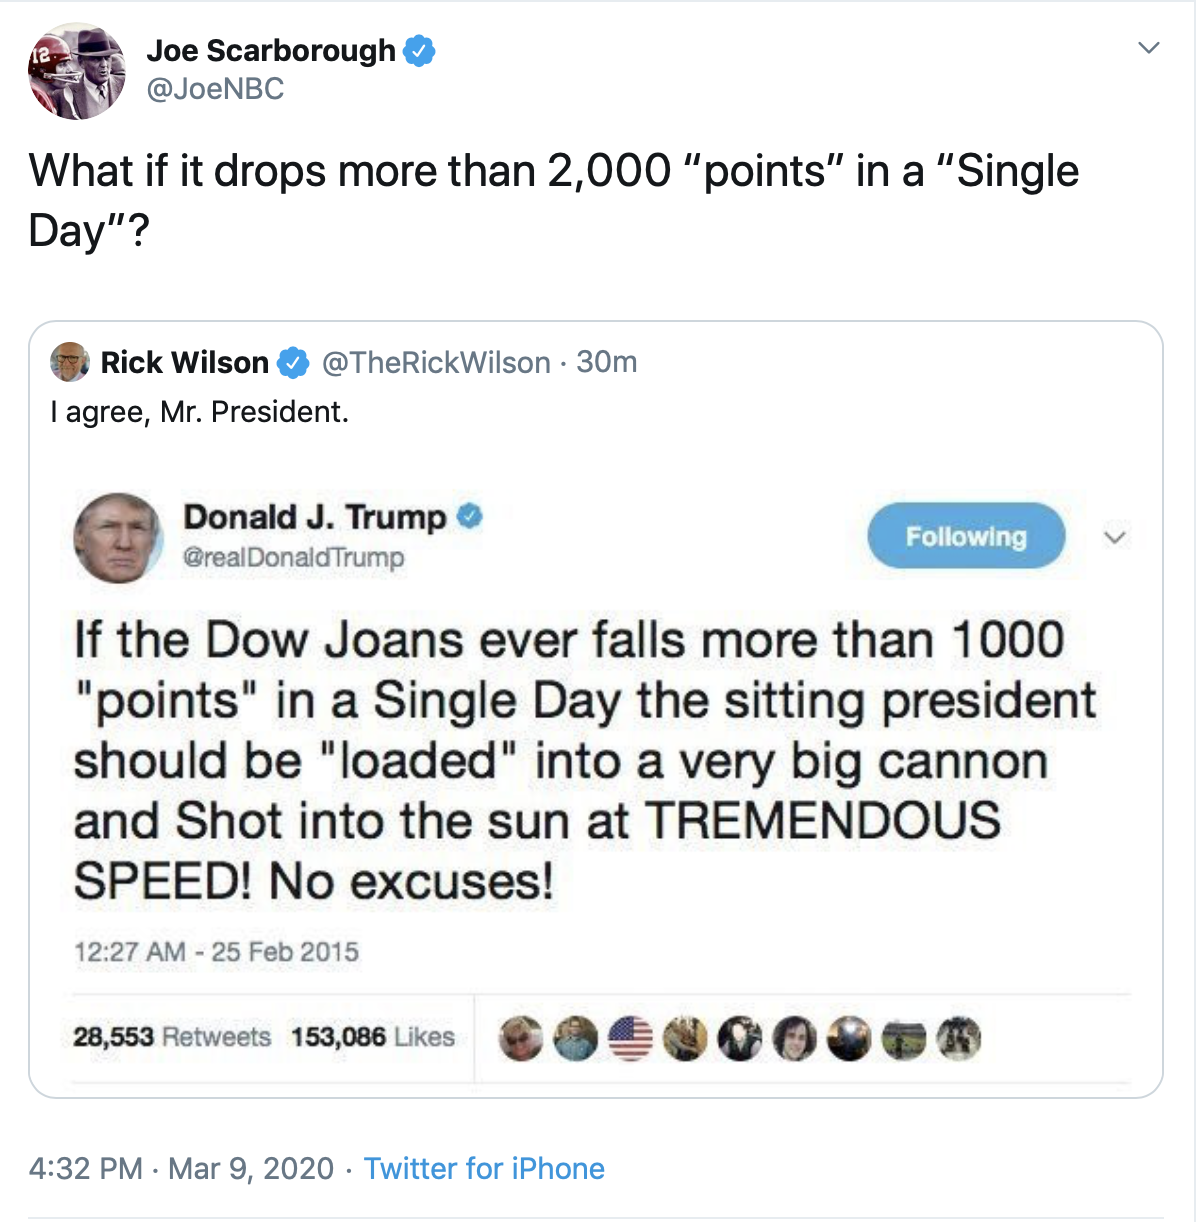 Joe Scarborough and Rick Wilson fell for an old, debunked fake Trump tweet as the Dow Jones took a hit Monday due to coronavirus fears. (Screenshot Twitter Joe Scarborough)